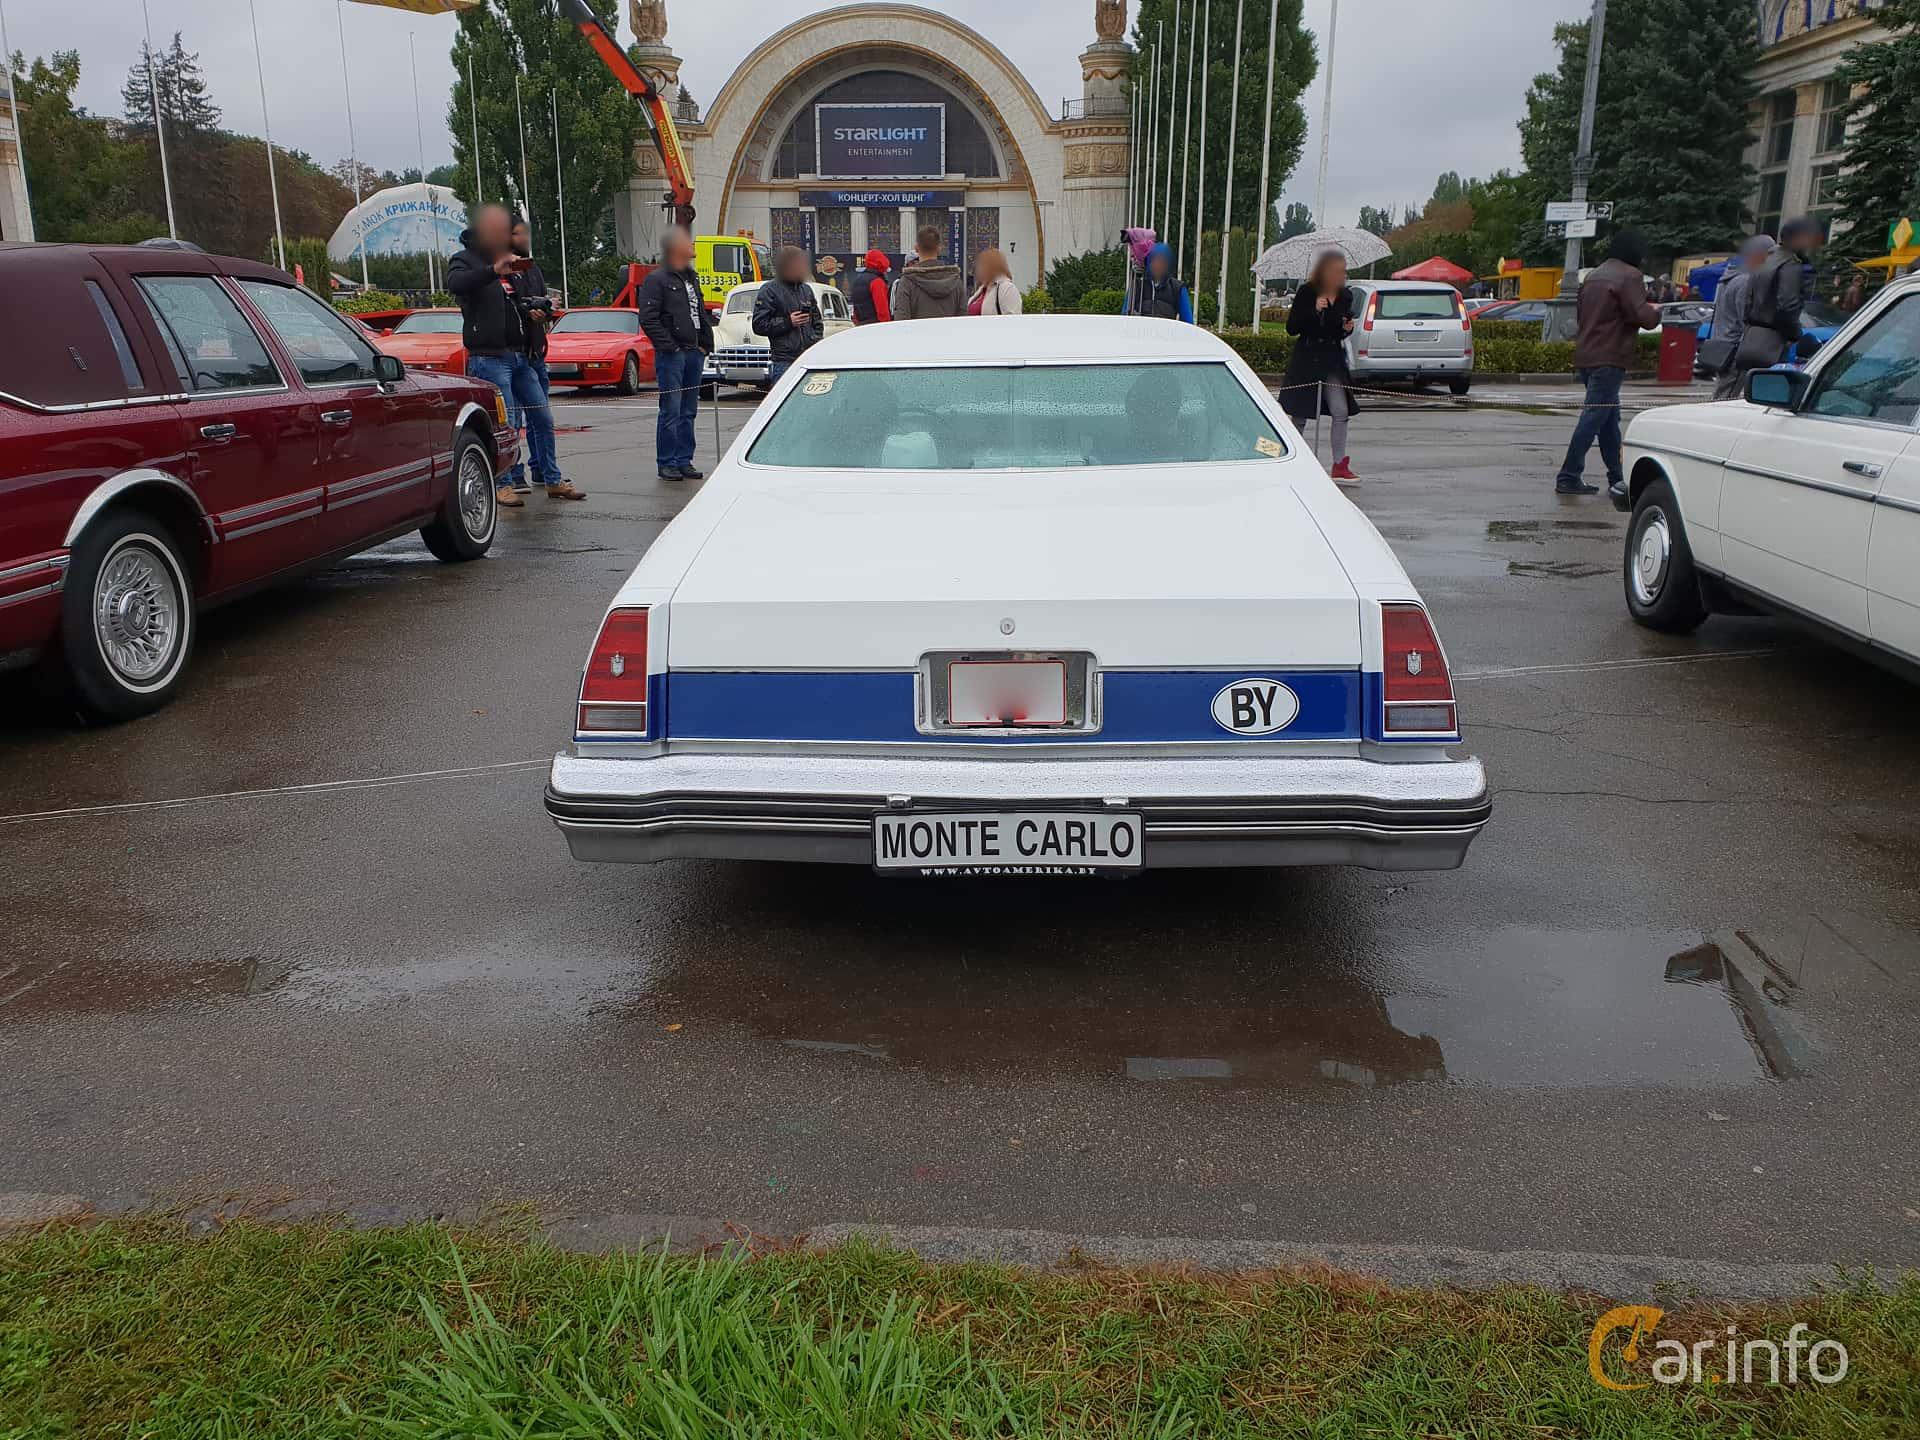 Chevrolet Monte Carlo 6.6 V8 Hydra-Matic, 177hp, 1975 at Old Car Land no.2 2018